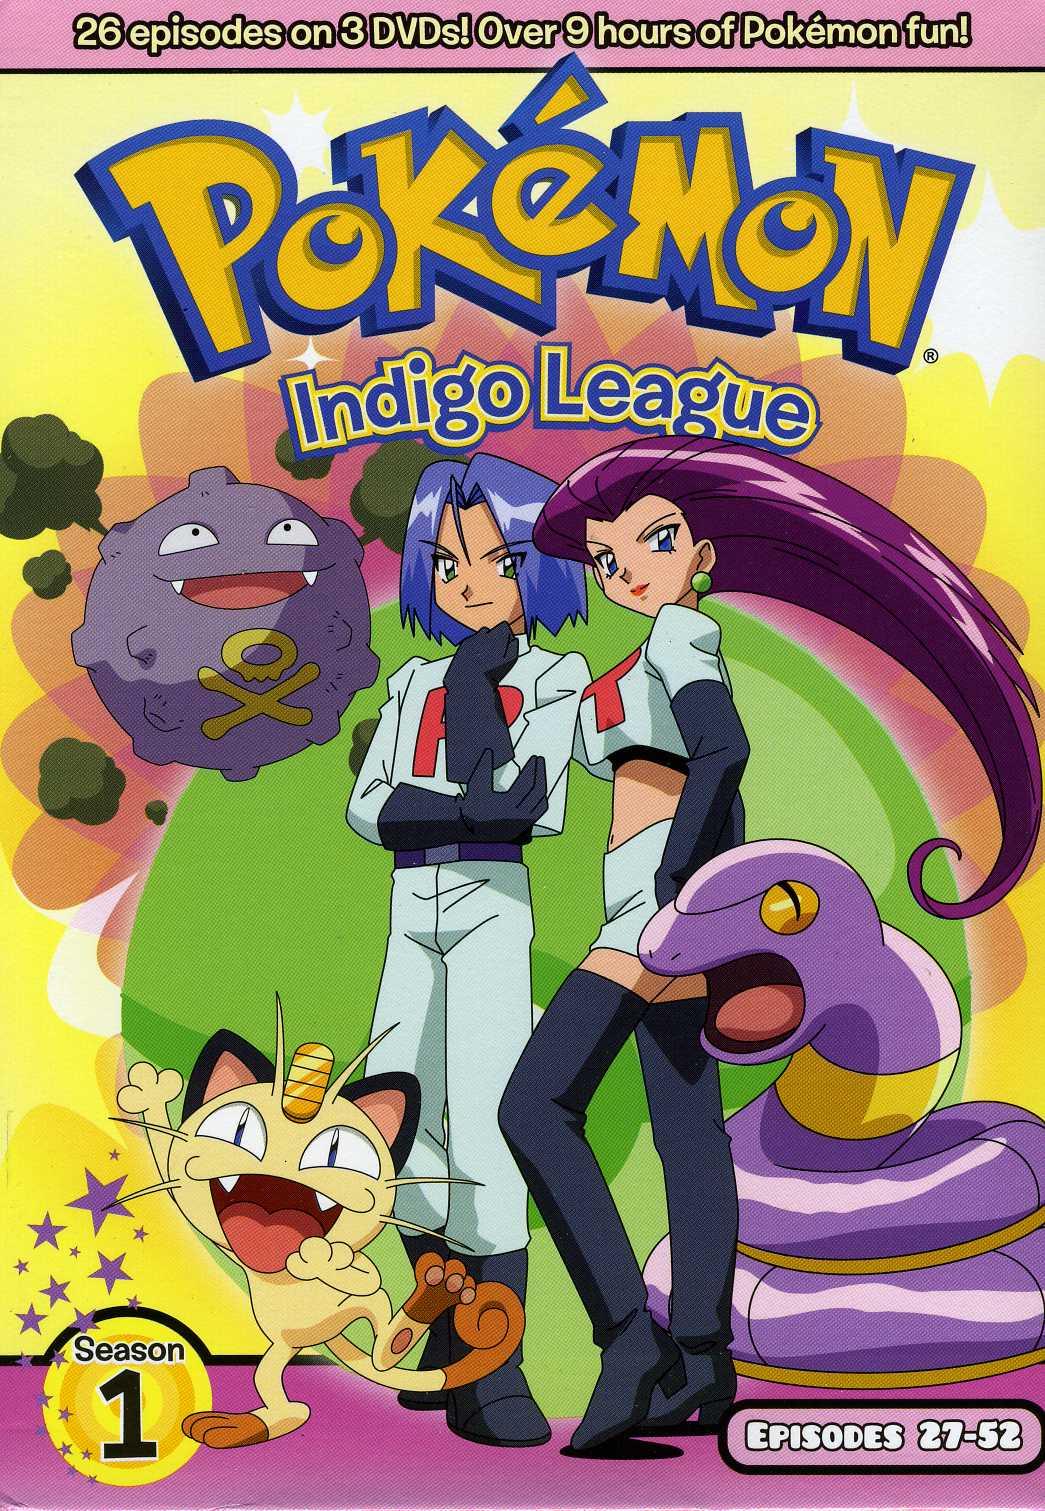 Pokemon Season 1: Indigo League Part 2 Box Set (DVD)